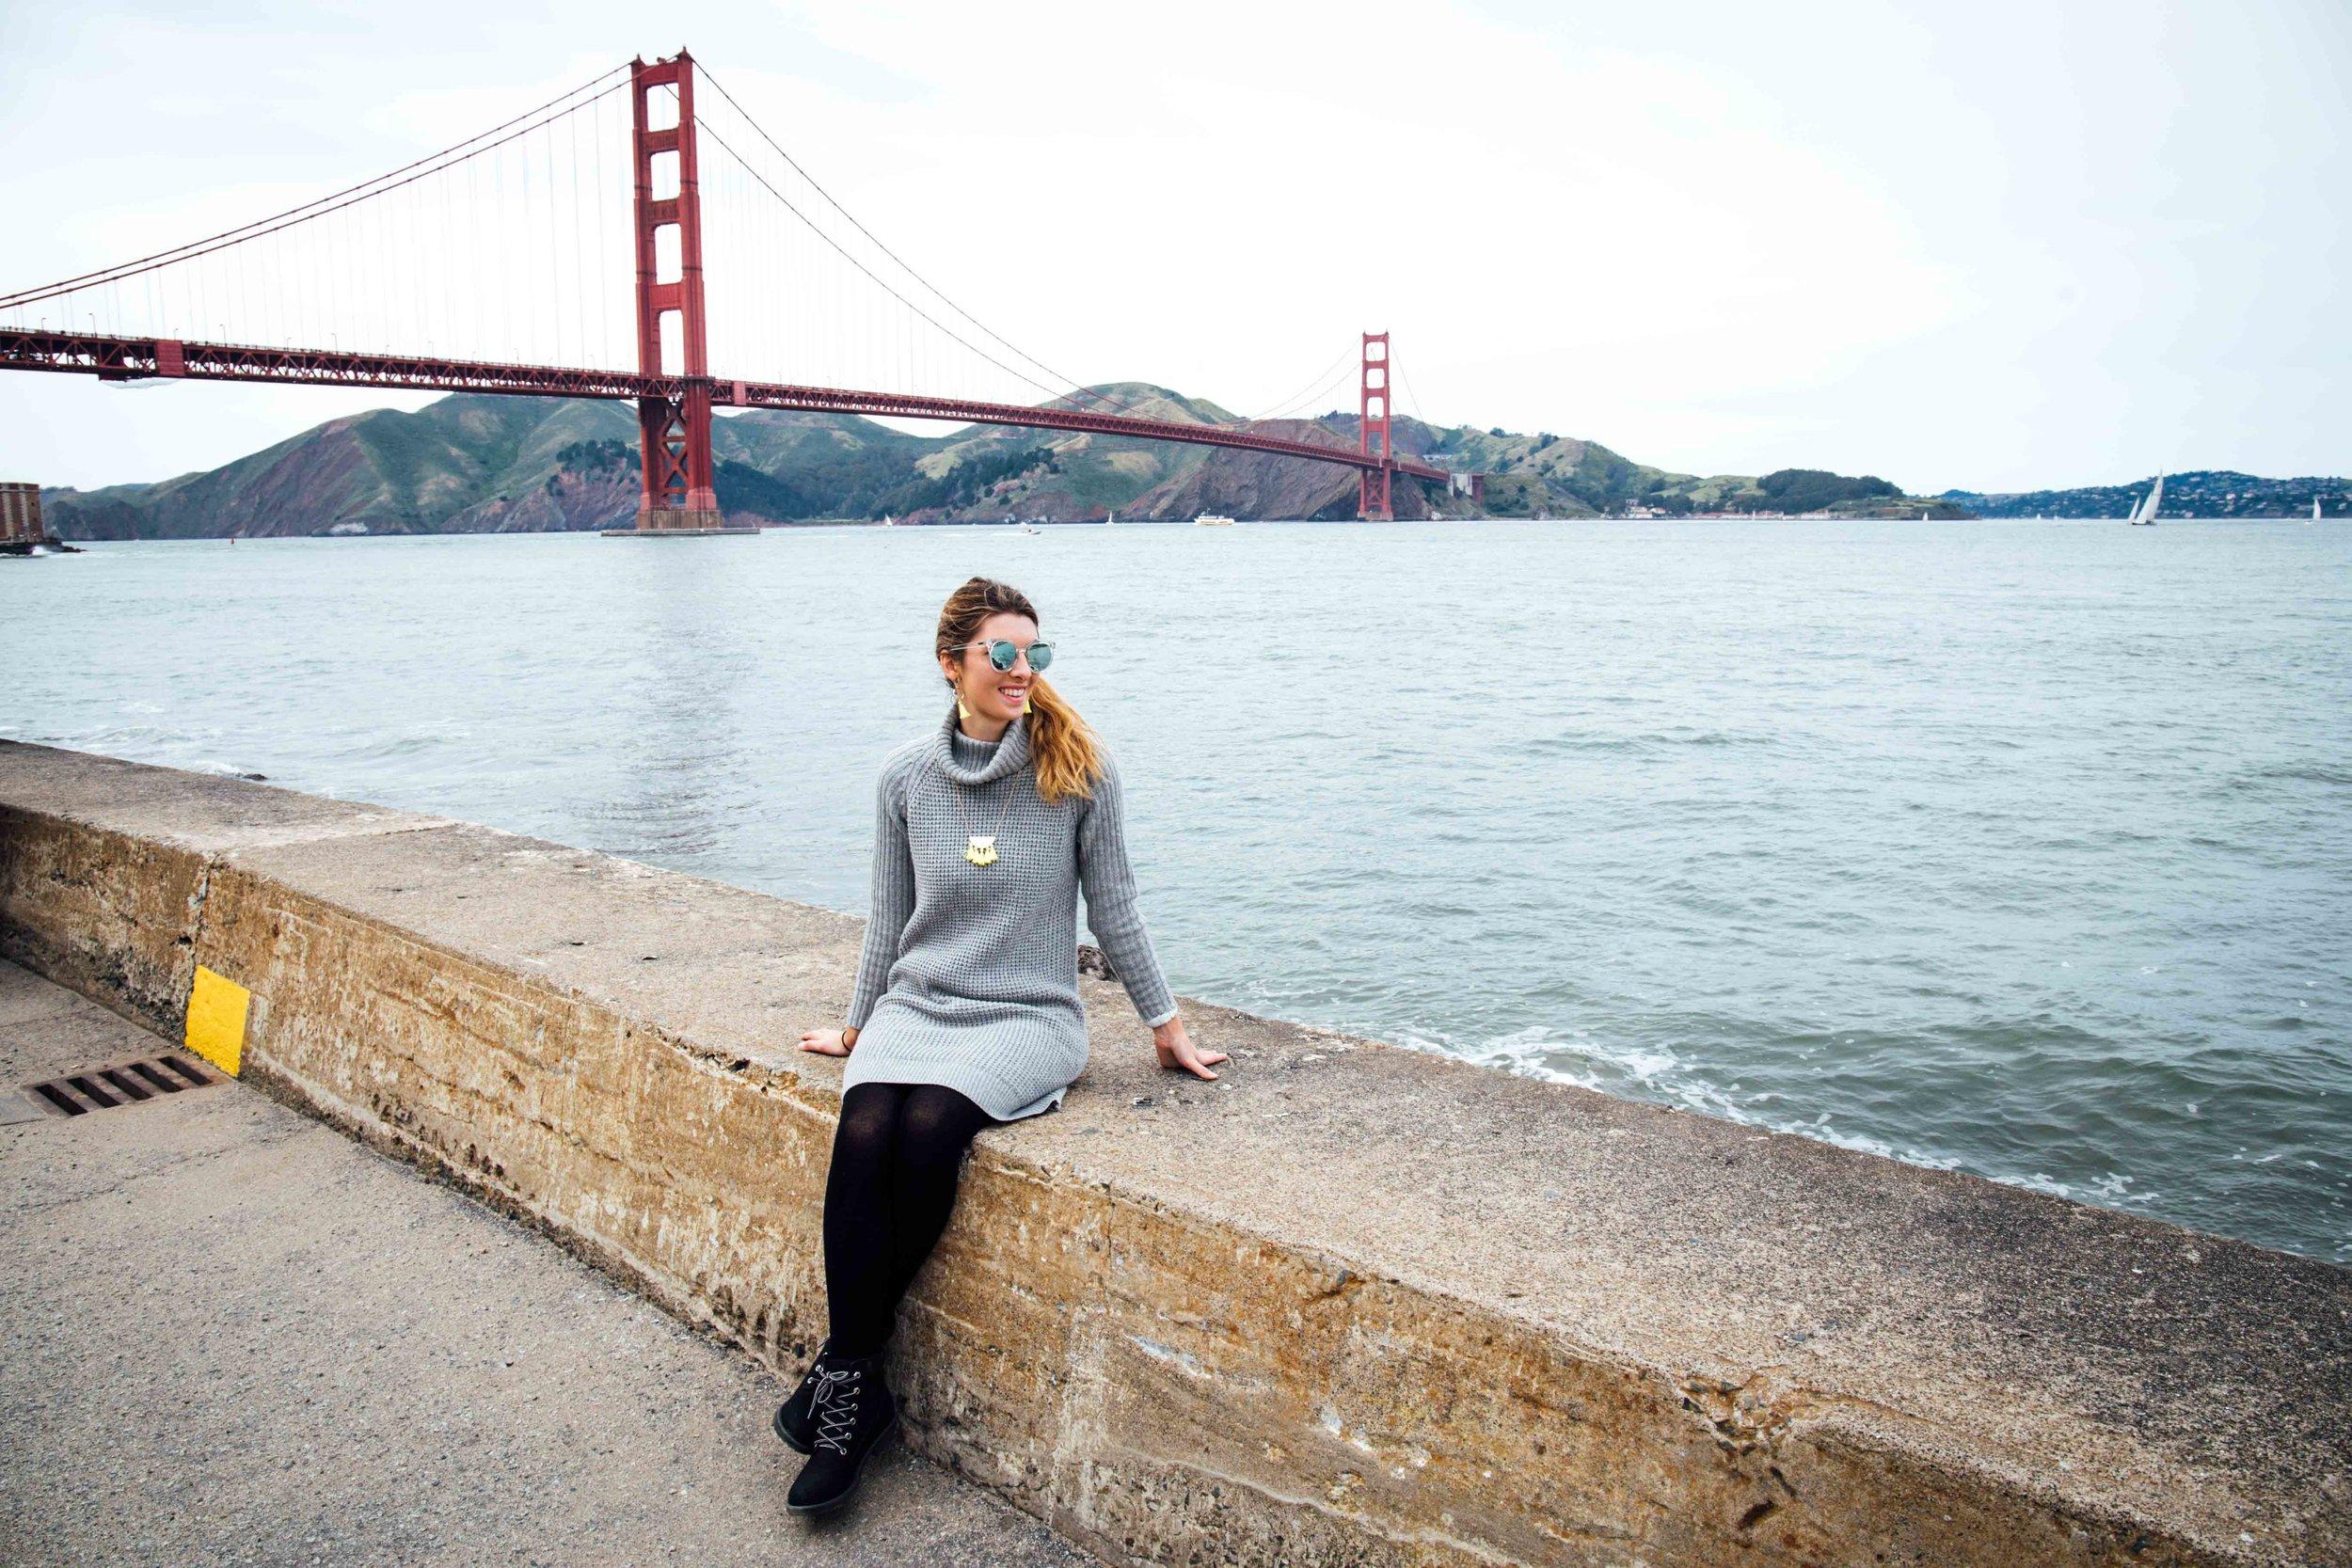 SanFrancisco-Woman-Travel-Solo.jpg